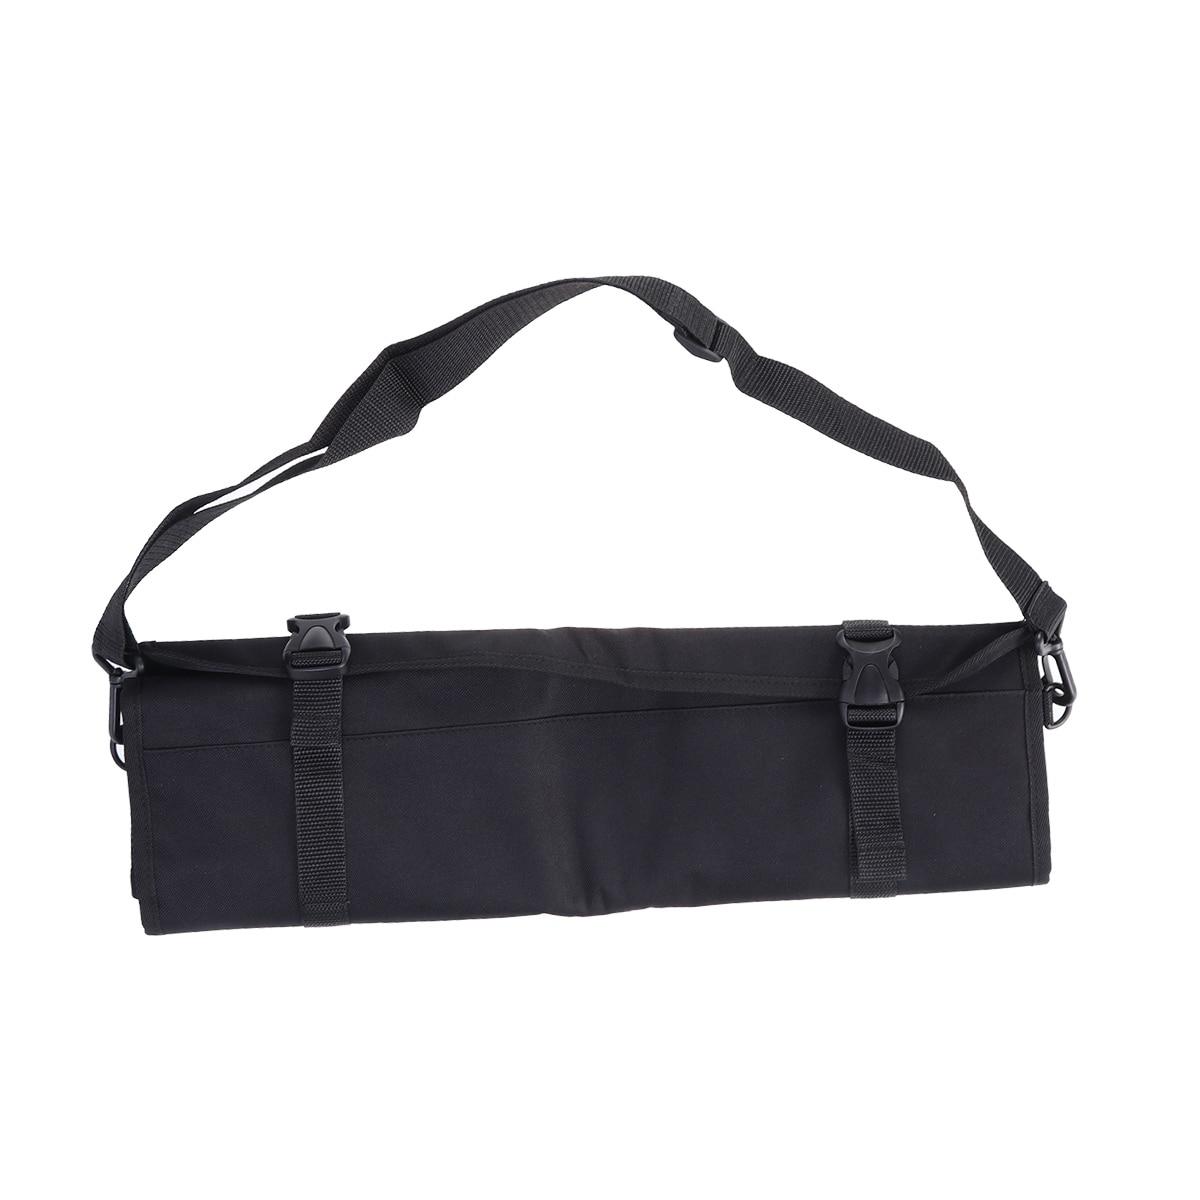 Tableware Bag Professional Kitchen Multifunction Dual Use Knife Roll Bag Holder Dinnerware Organizer Chef Knife Case Strap